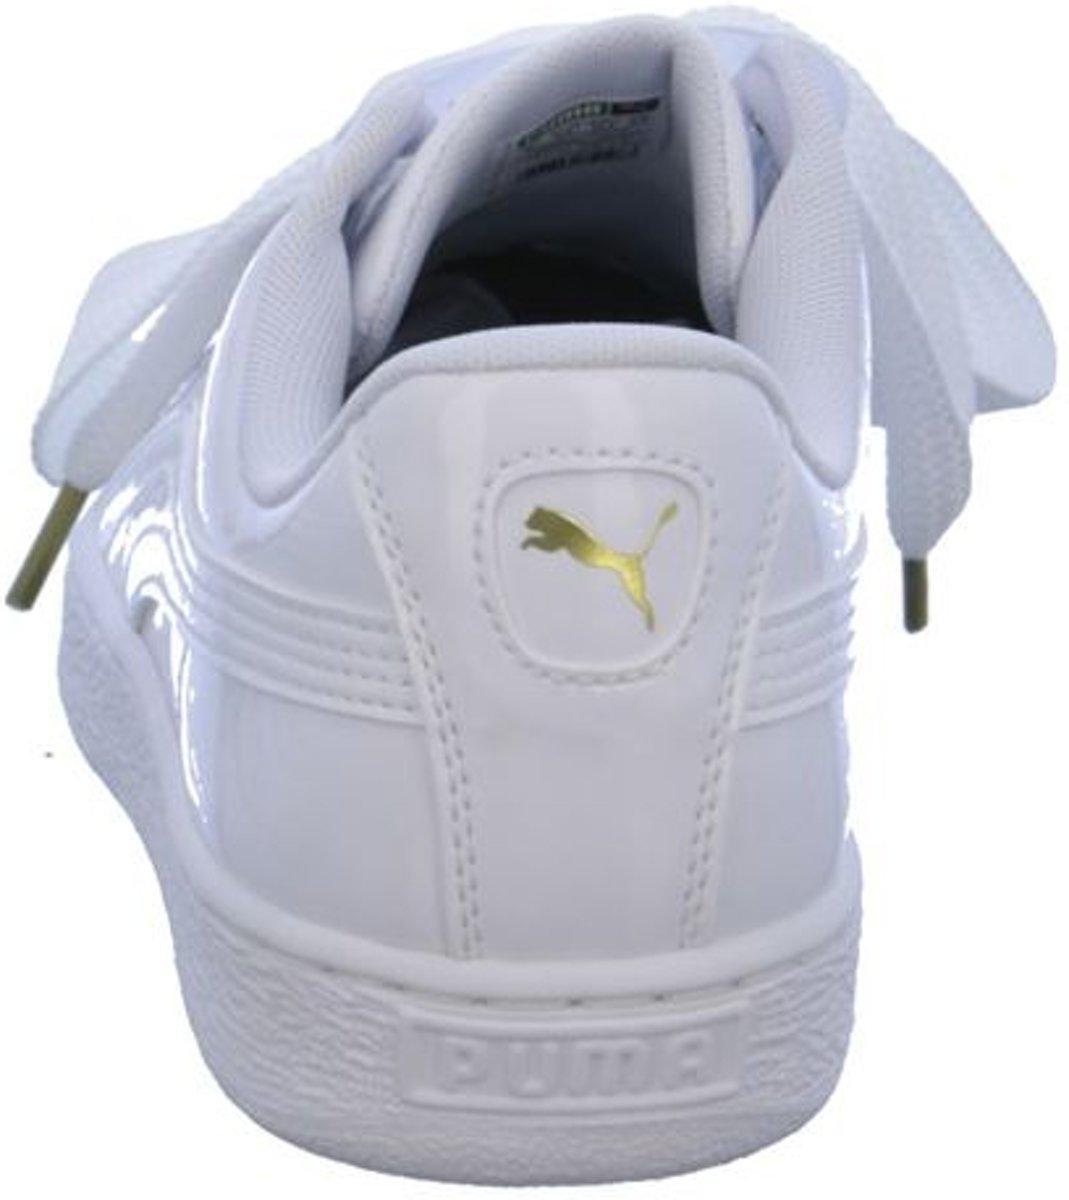 Puma 363073 Sneaker laag gekleed Dames Maat 40,5 Wit 02 Puma WhitePuma White